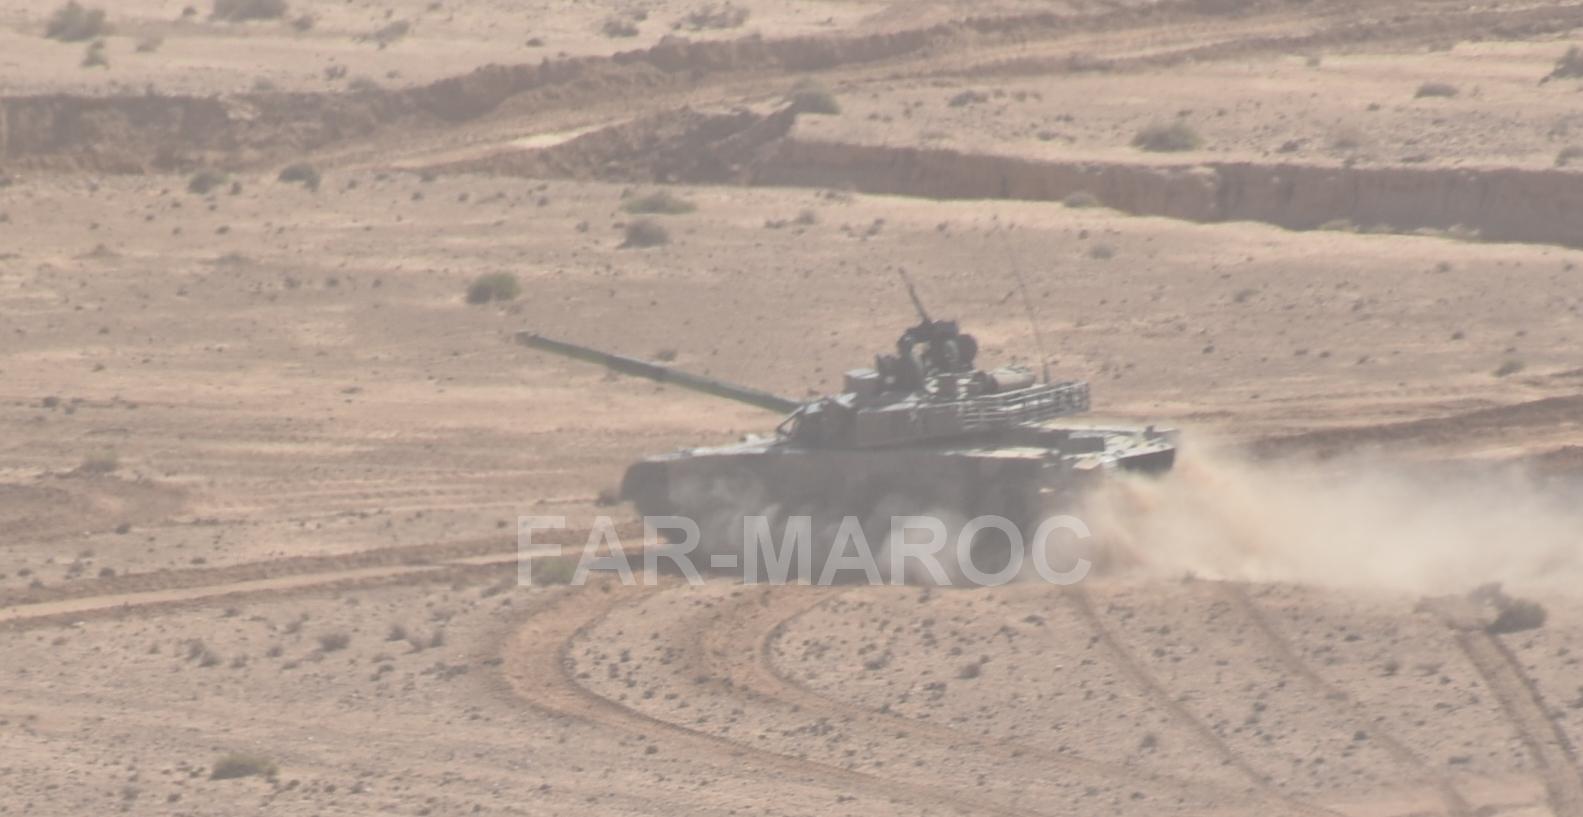 Chars VT-1A Marocains / Moroccan VT-1A MBT - Page 32 49275808982_59c0bfe584_o